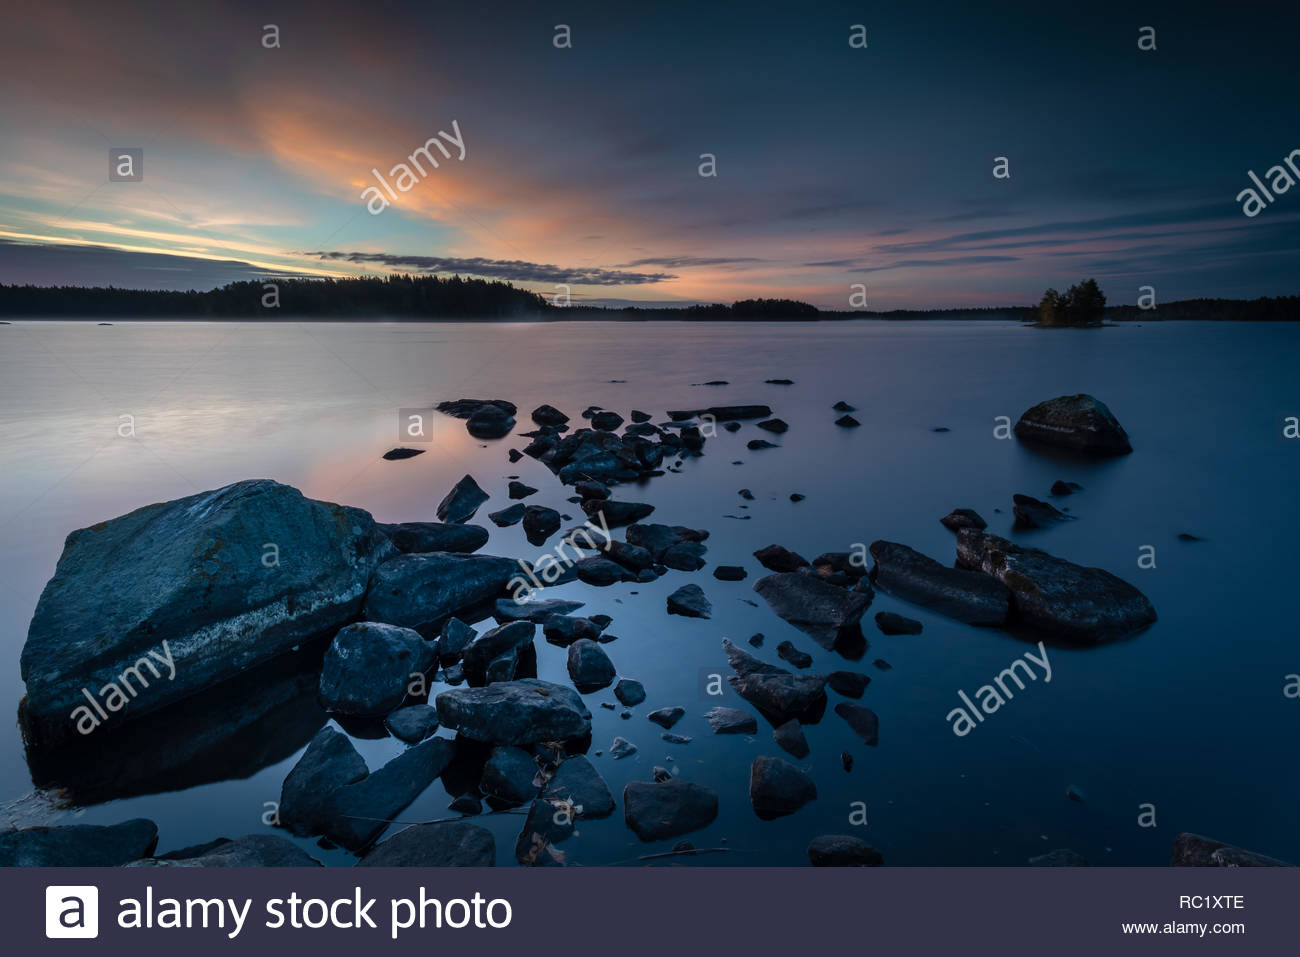 Dark scenic lake landscape, blue morning - Stock Image